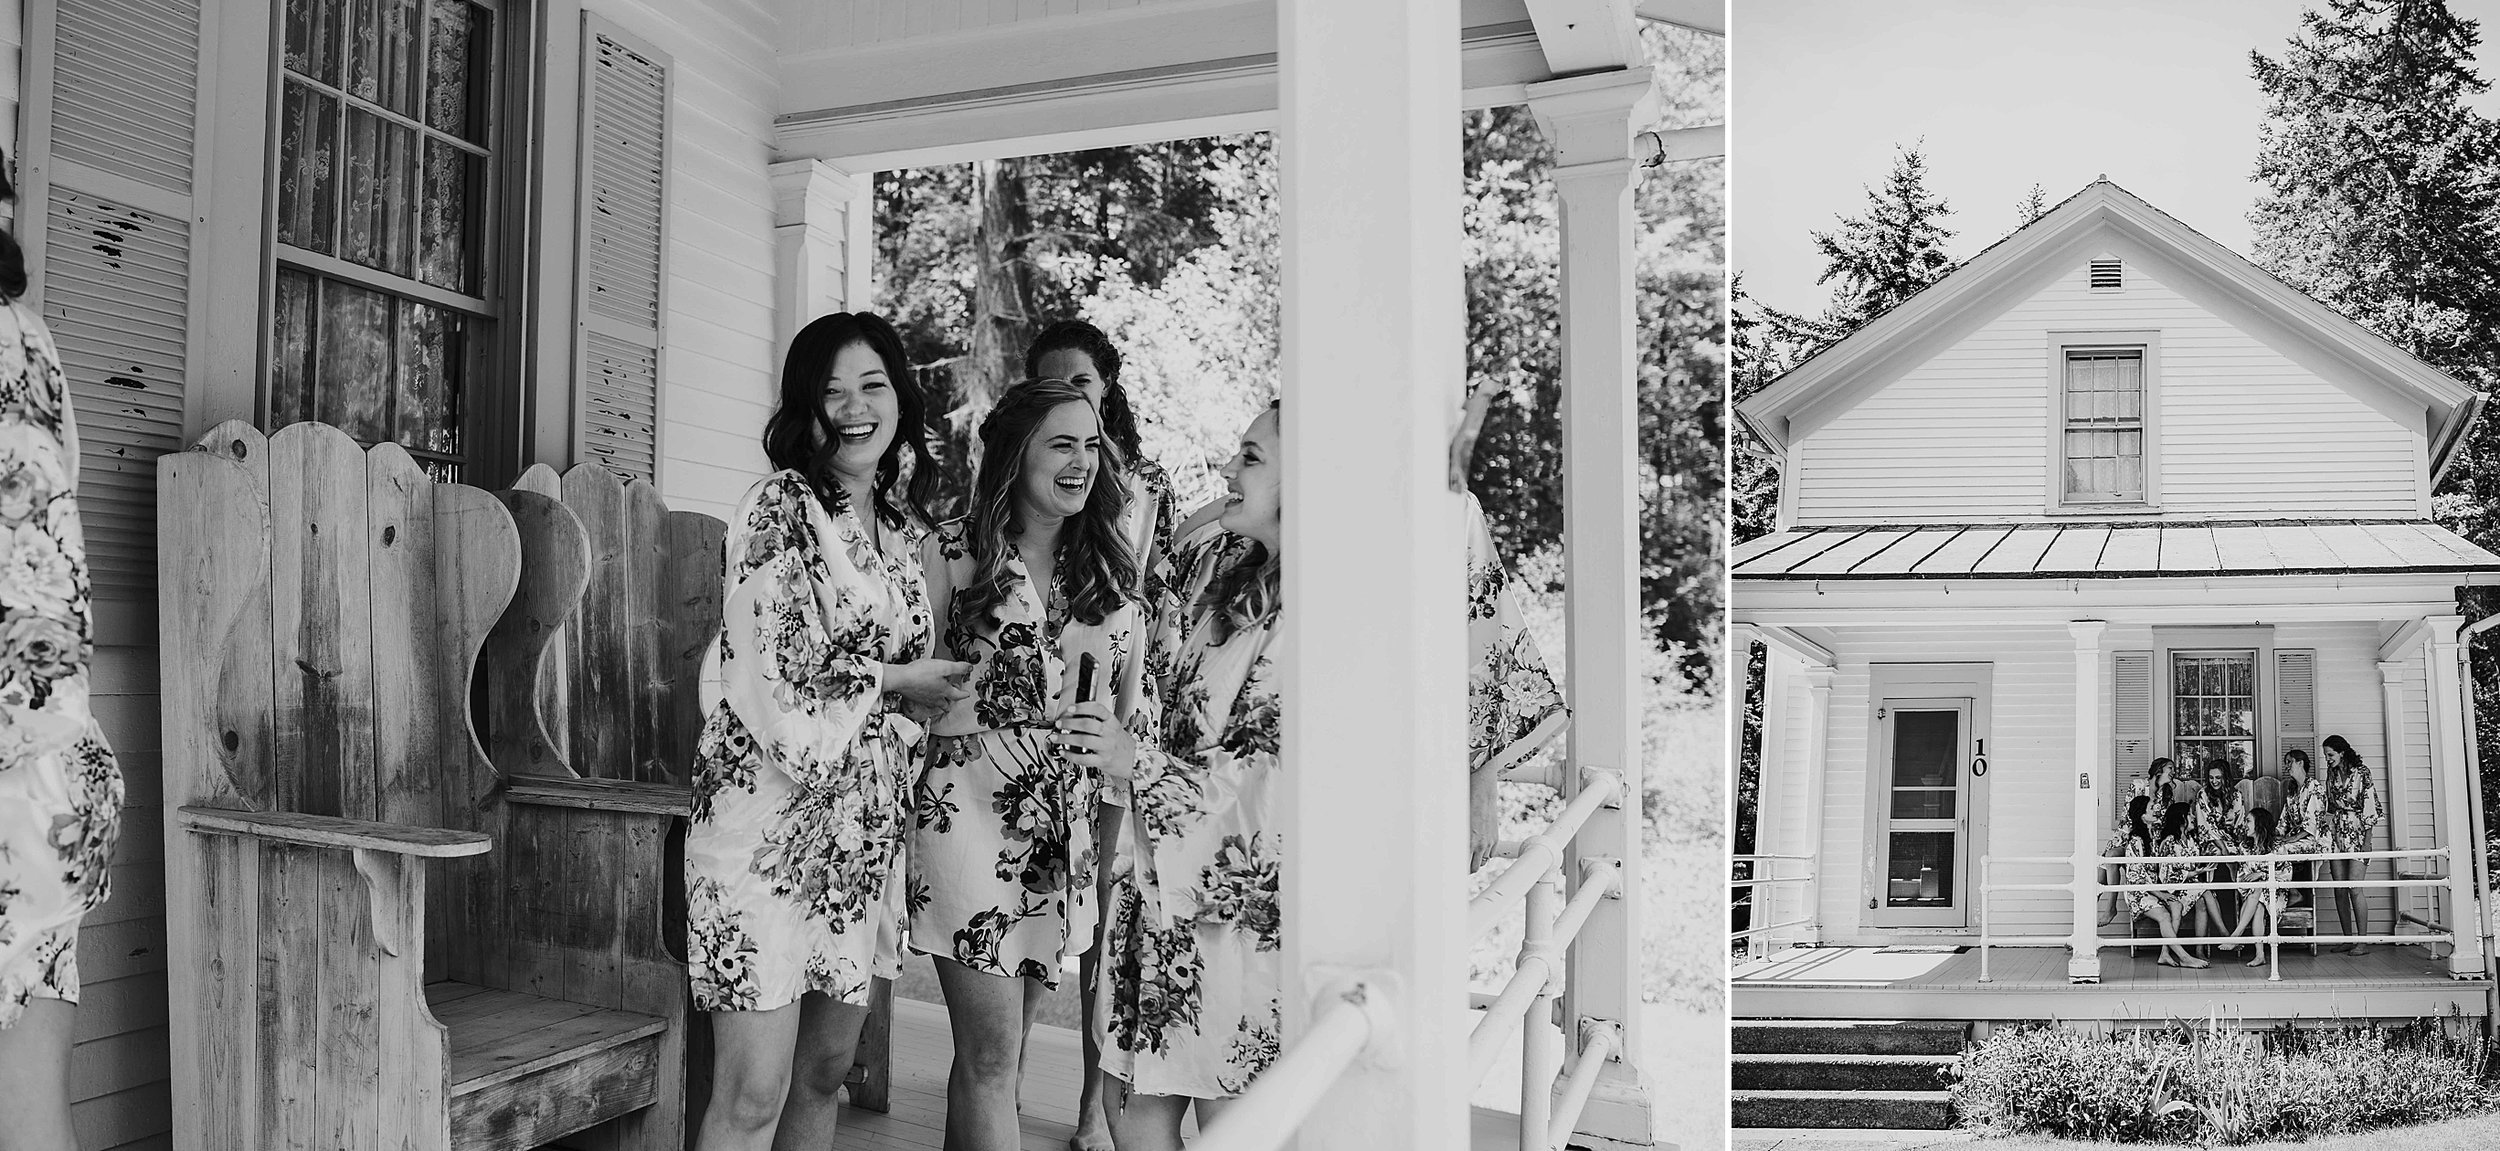 Crockett Farm-Wedding-photographer-J HODGES PHOTOGRAPHY_0284.jpg